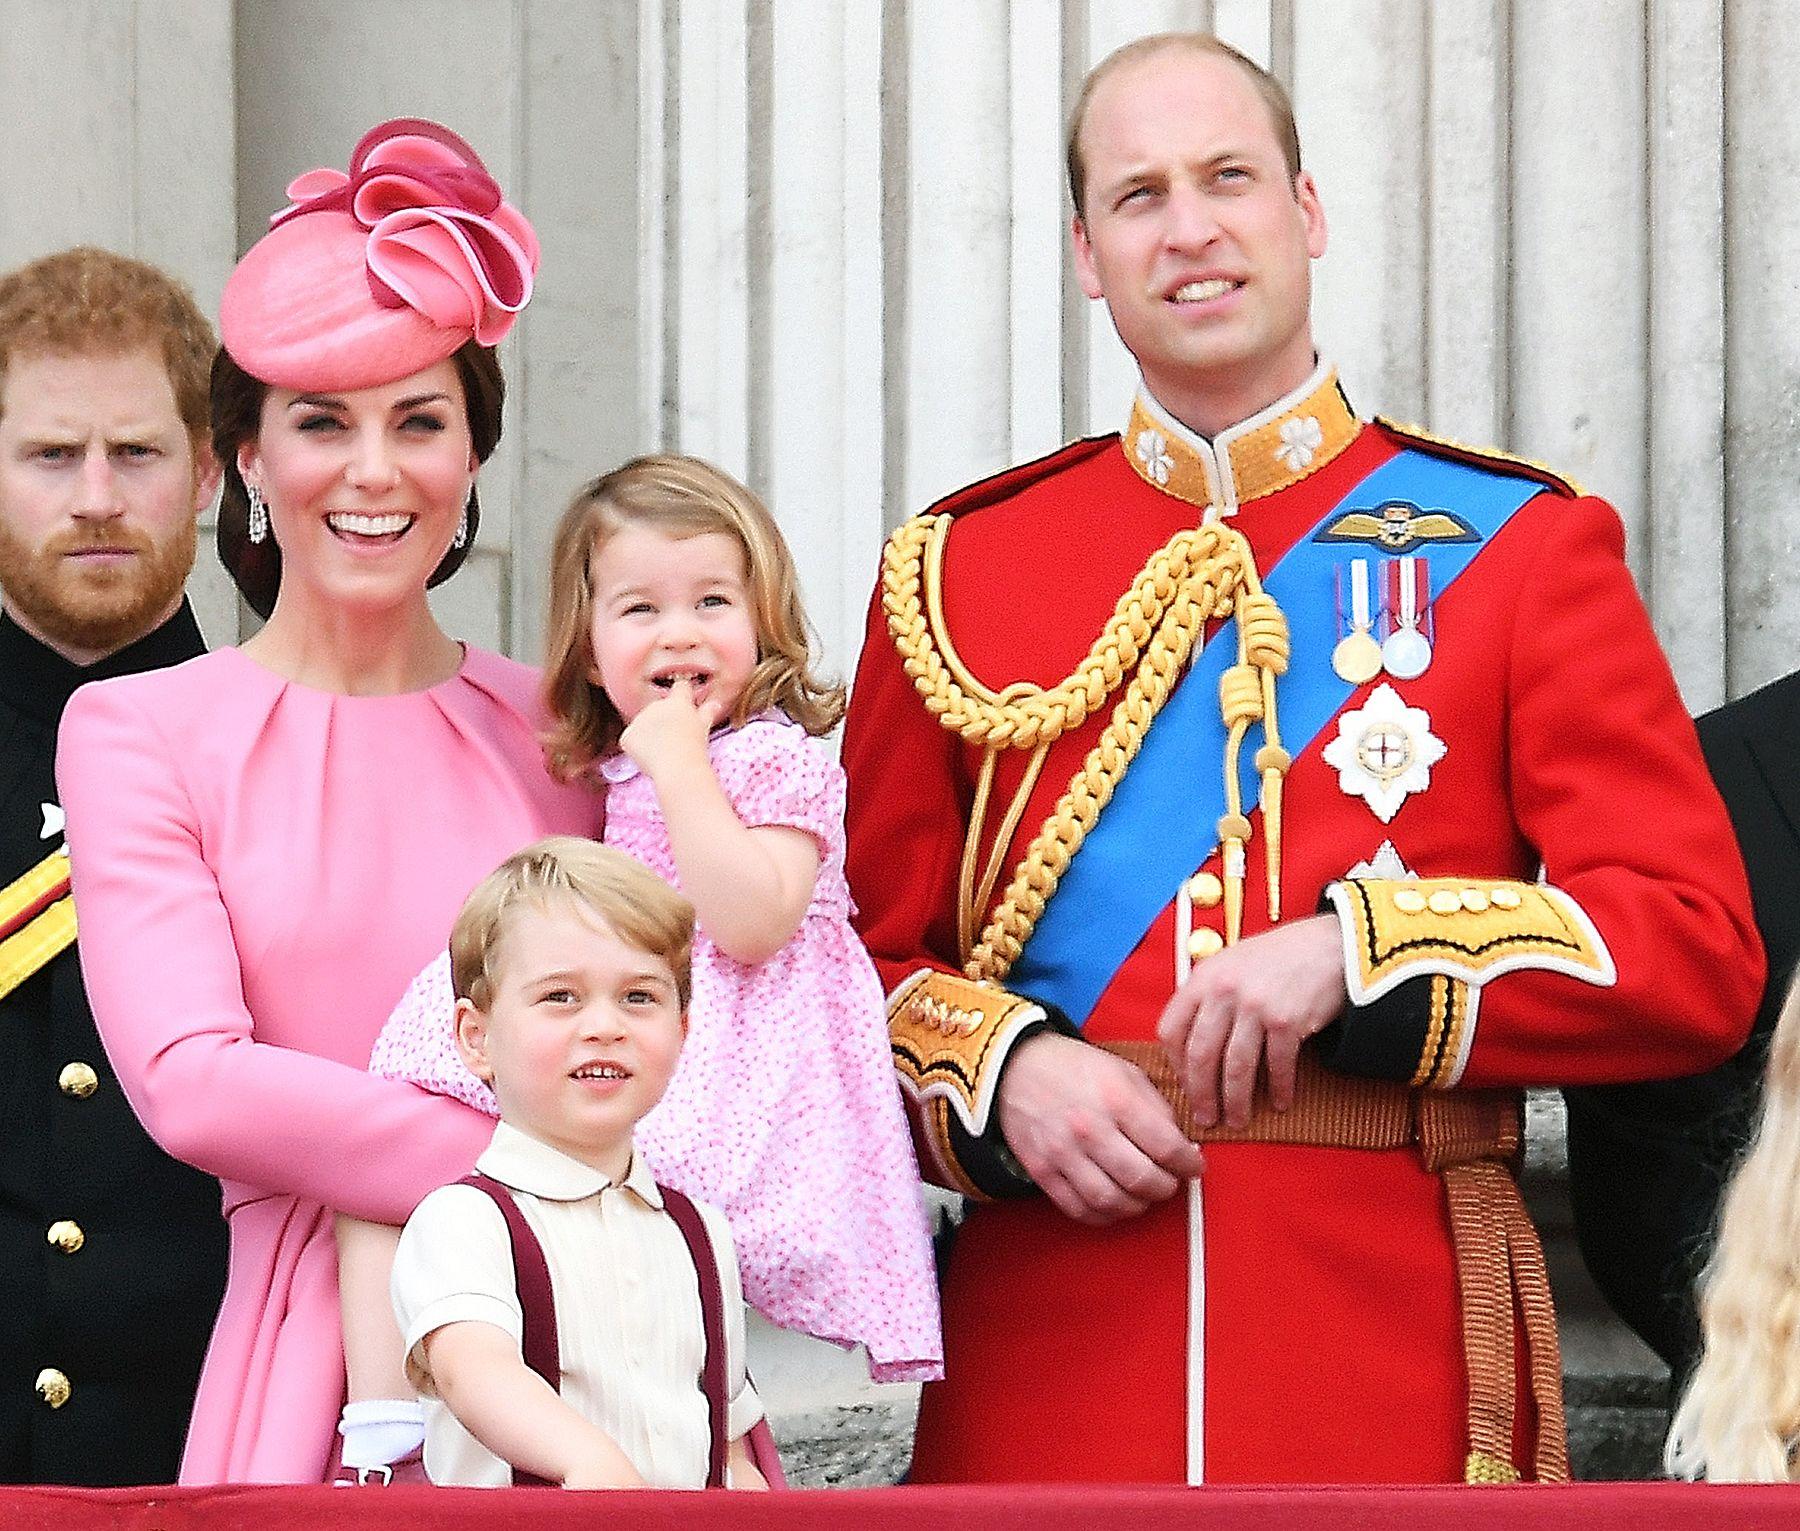 Pin de Annette Moss en My favorite royals | Pinterest